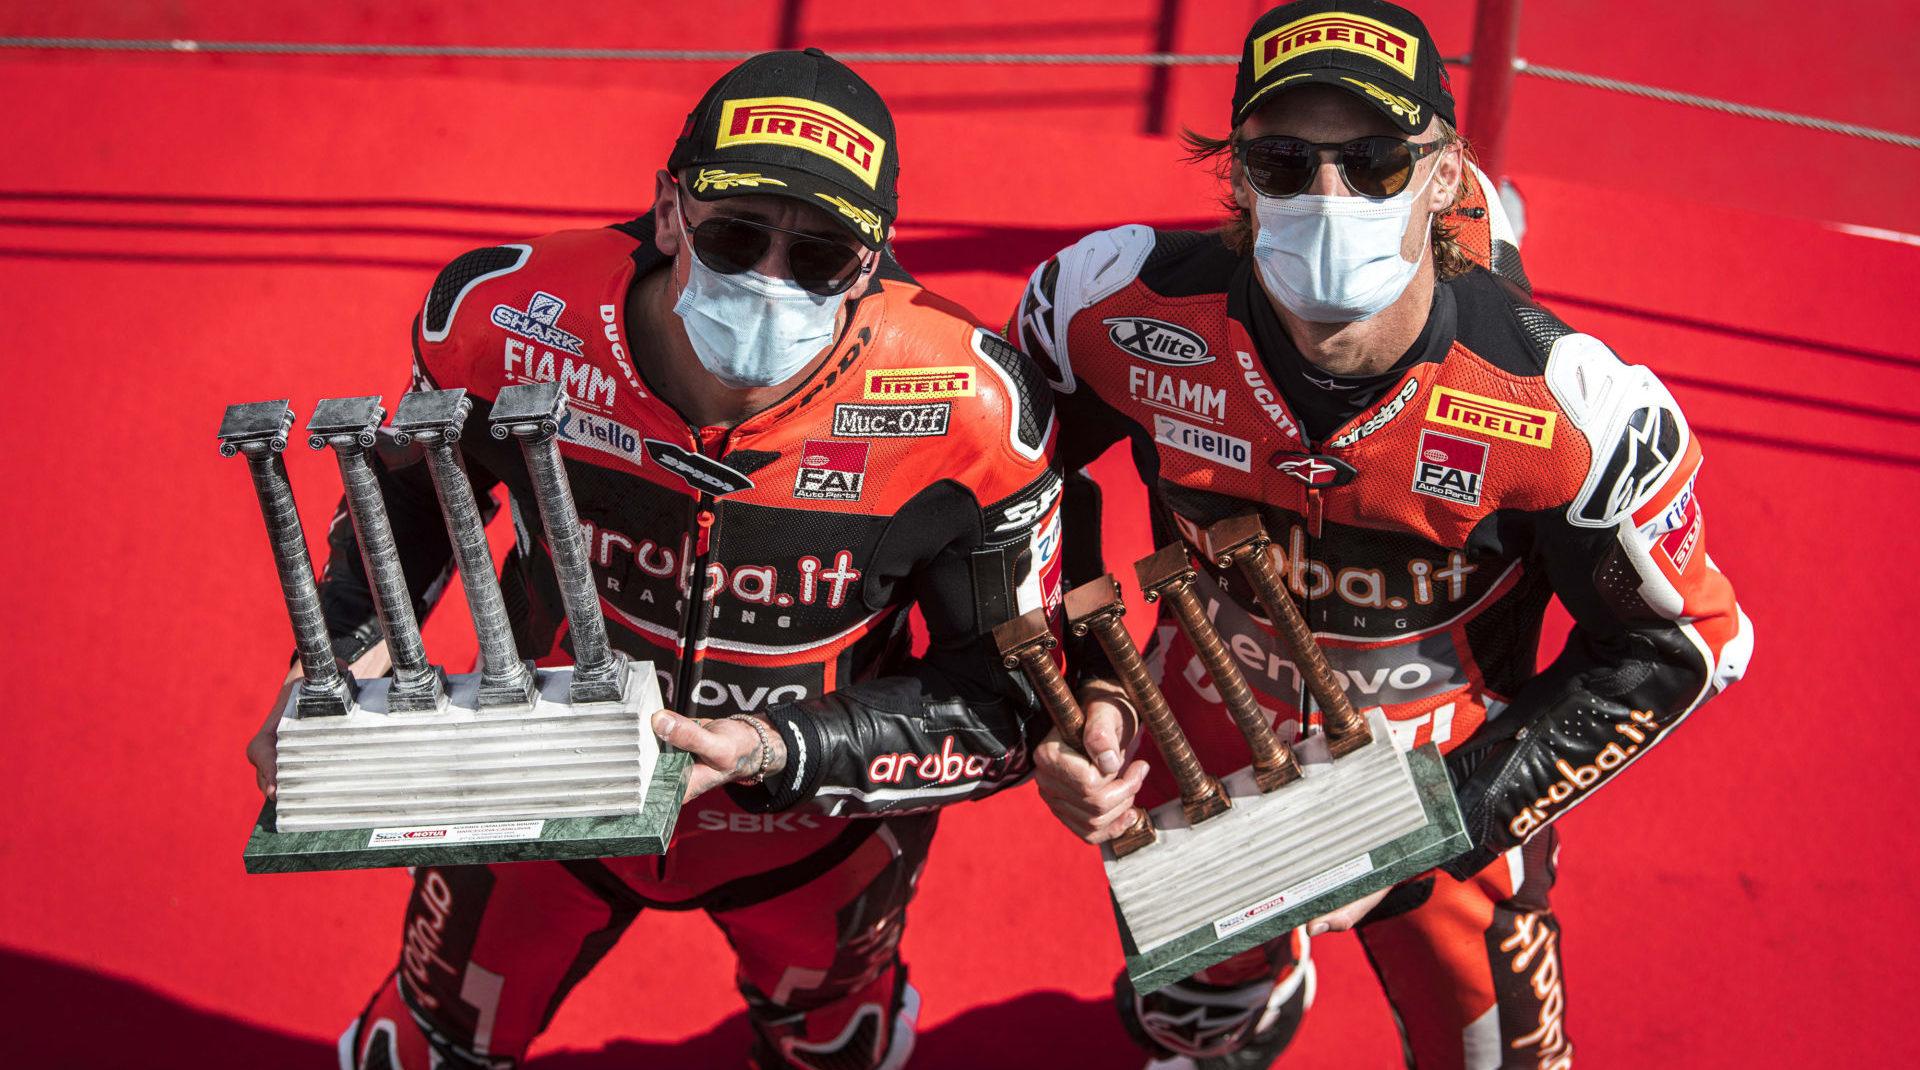 Aruba.it Racing Ducati riders Scott Redding (left) and Chaz Davies (right). Photo courtesy Aruba.it Racing Ducati.